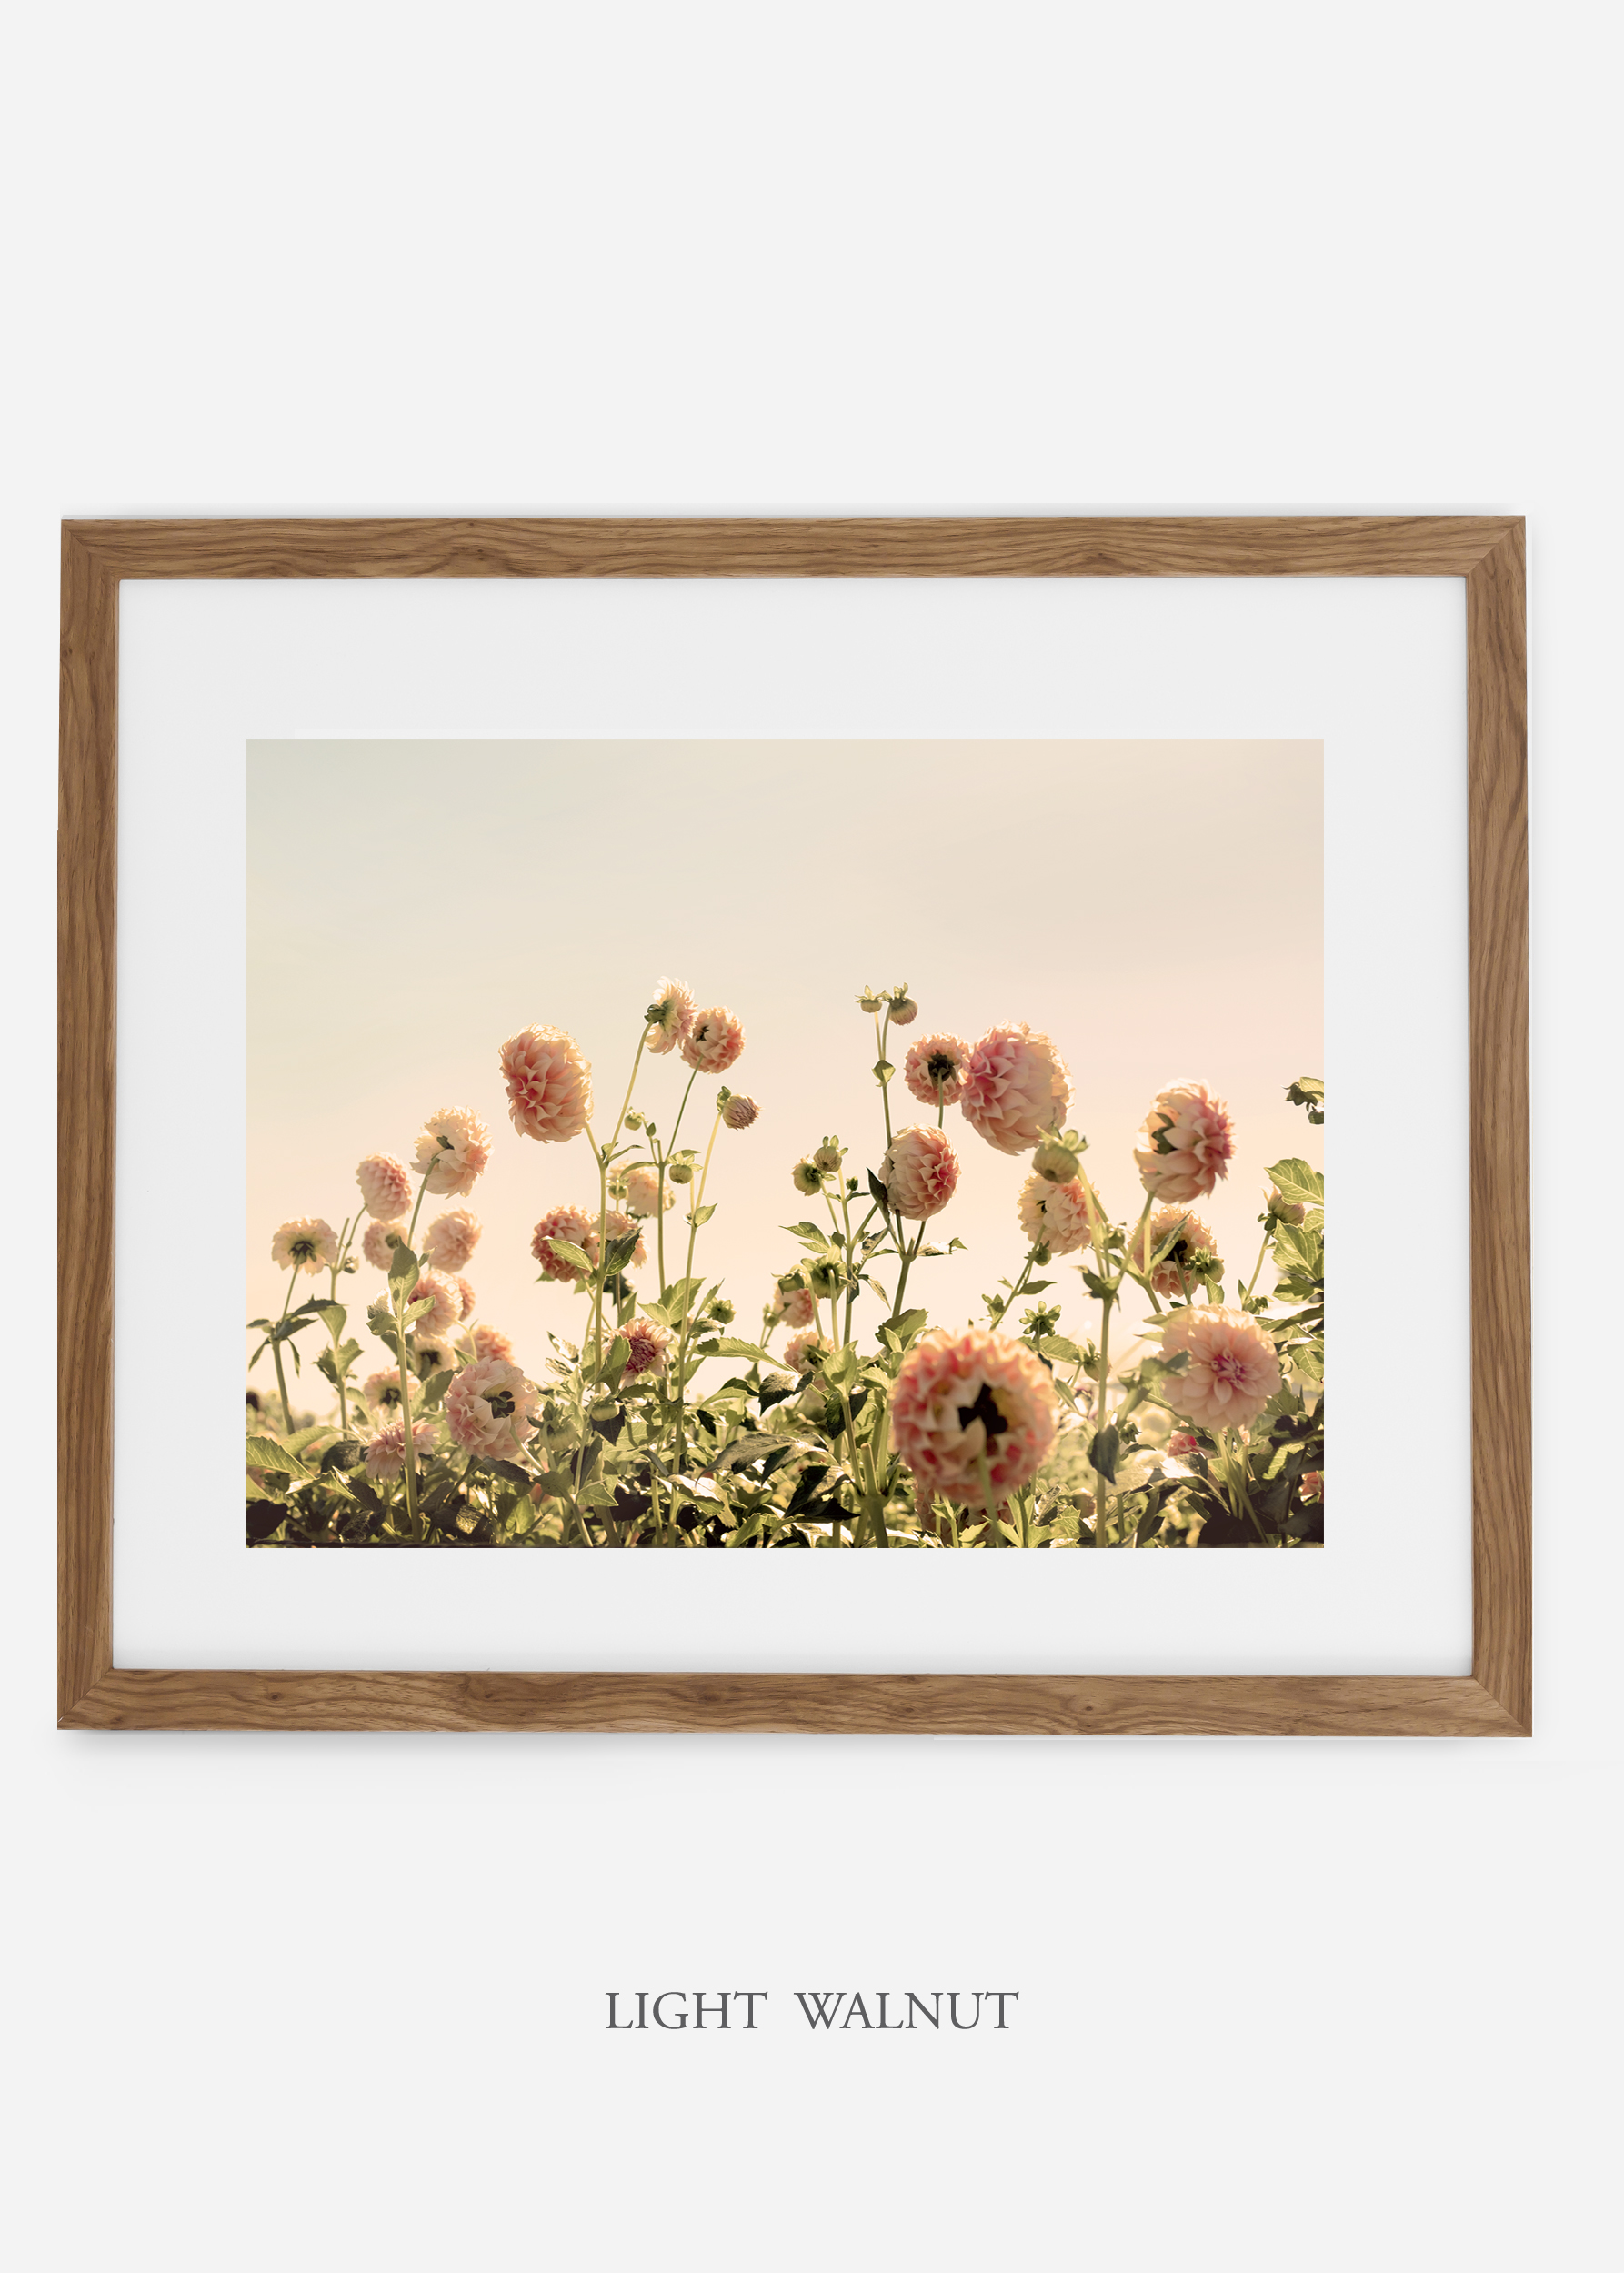 LightWalnutFrame_DahliaNo.1_WilderCalifornia_Art_Floral_Homedecor_Prints_Dahlia_Botanical_Artwork_Interiordesign.jpg